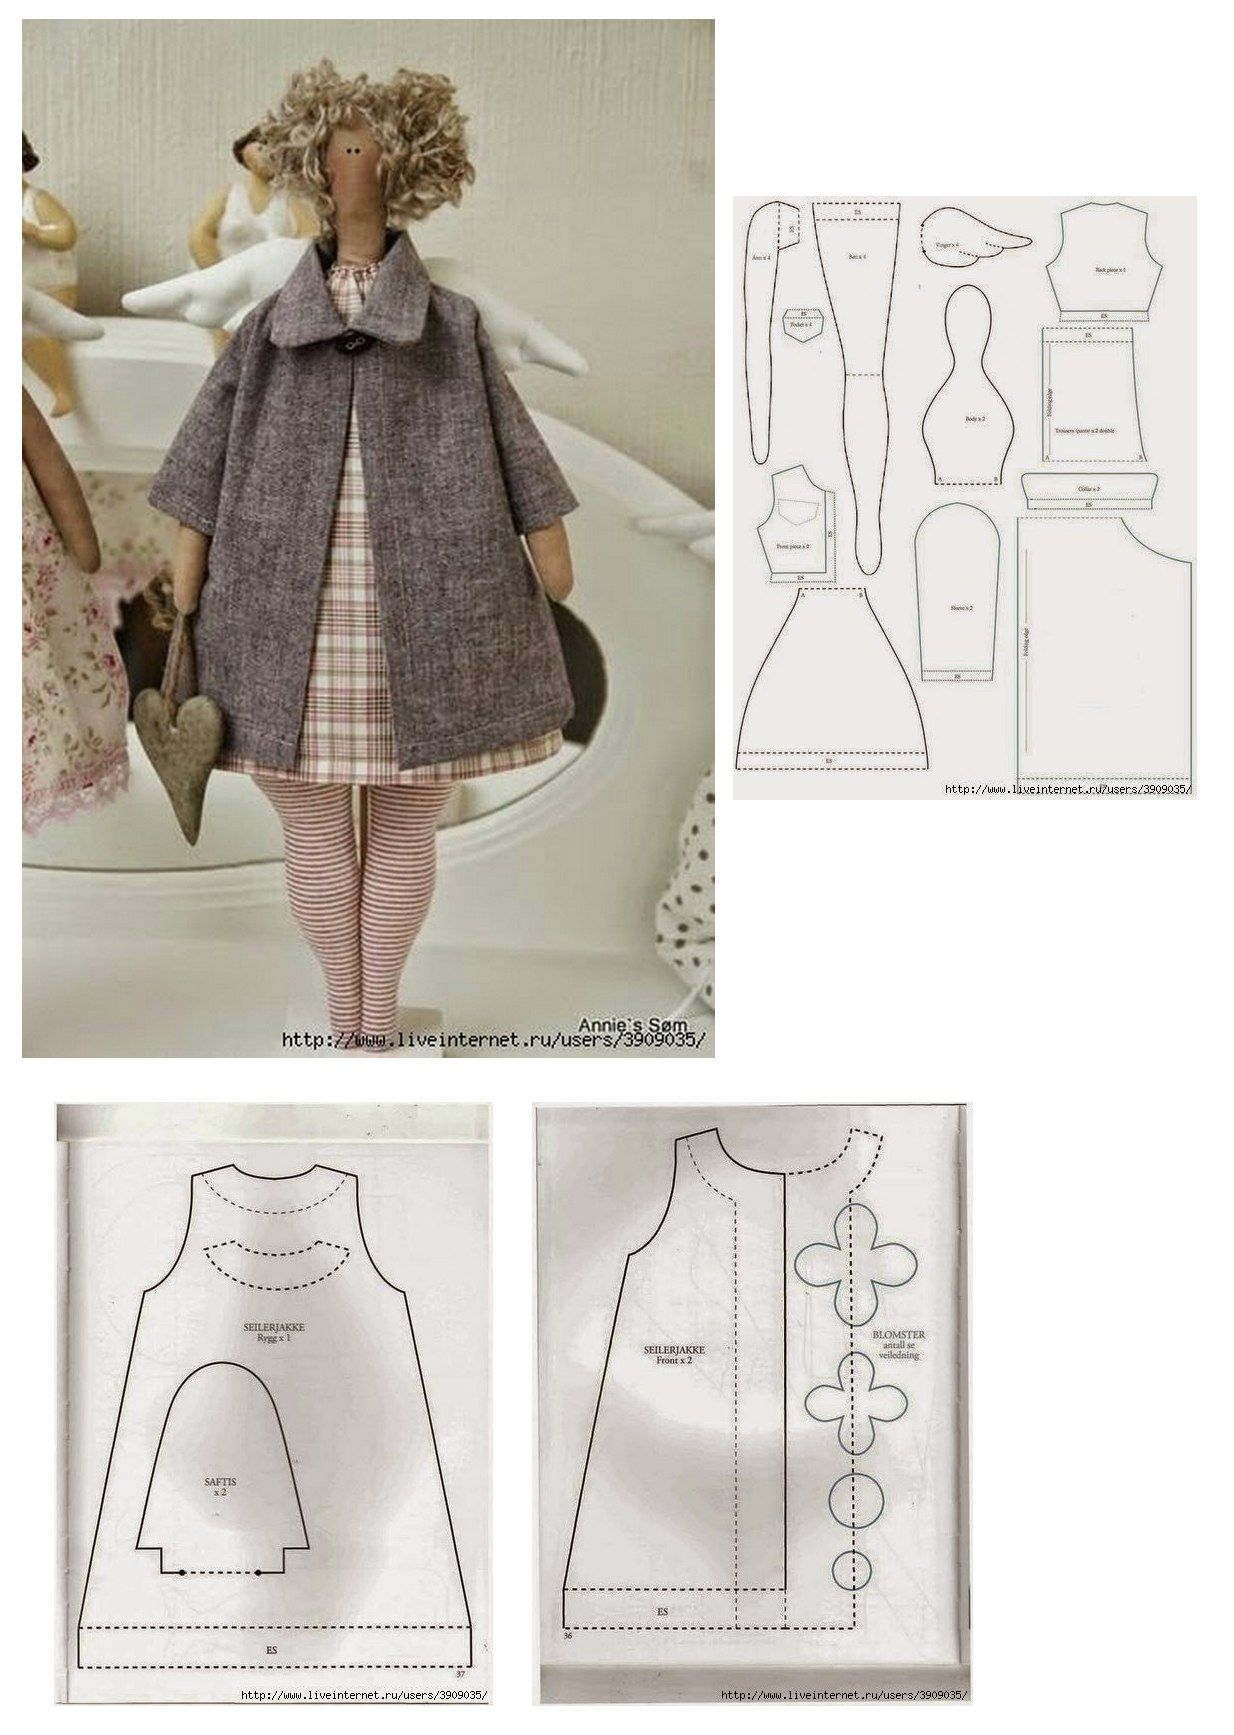 Tilda doll pattern | Craft - no $ | Pinterest | Muñecas, Muñecas de ...